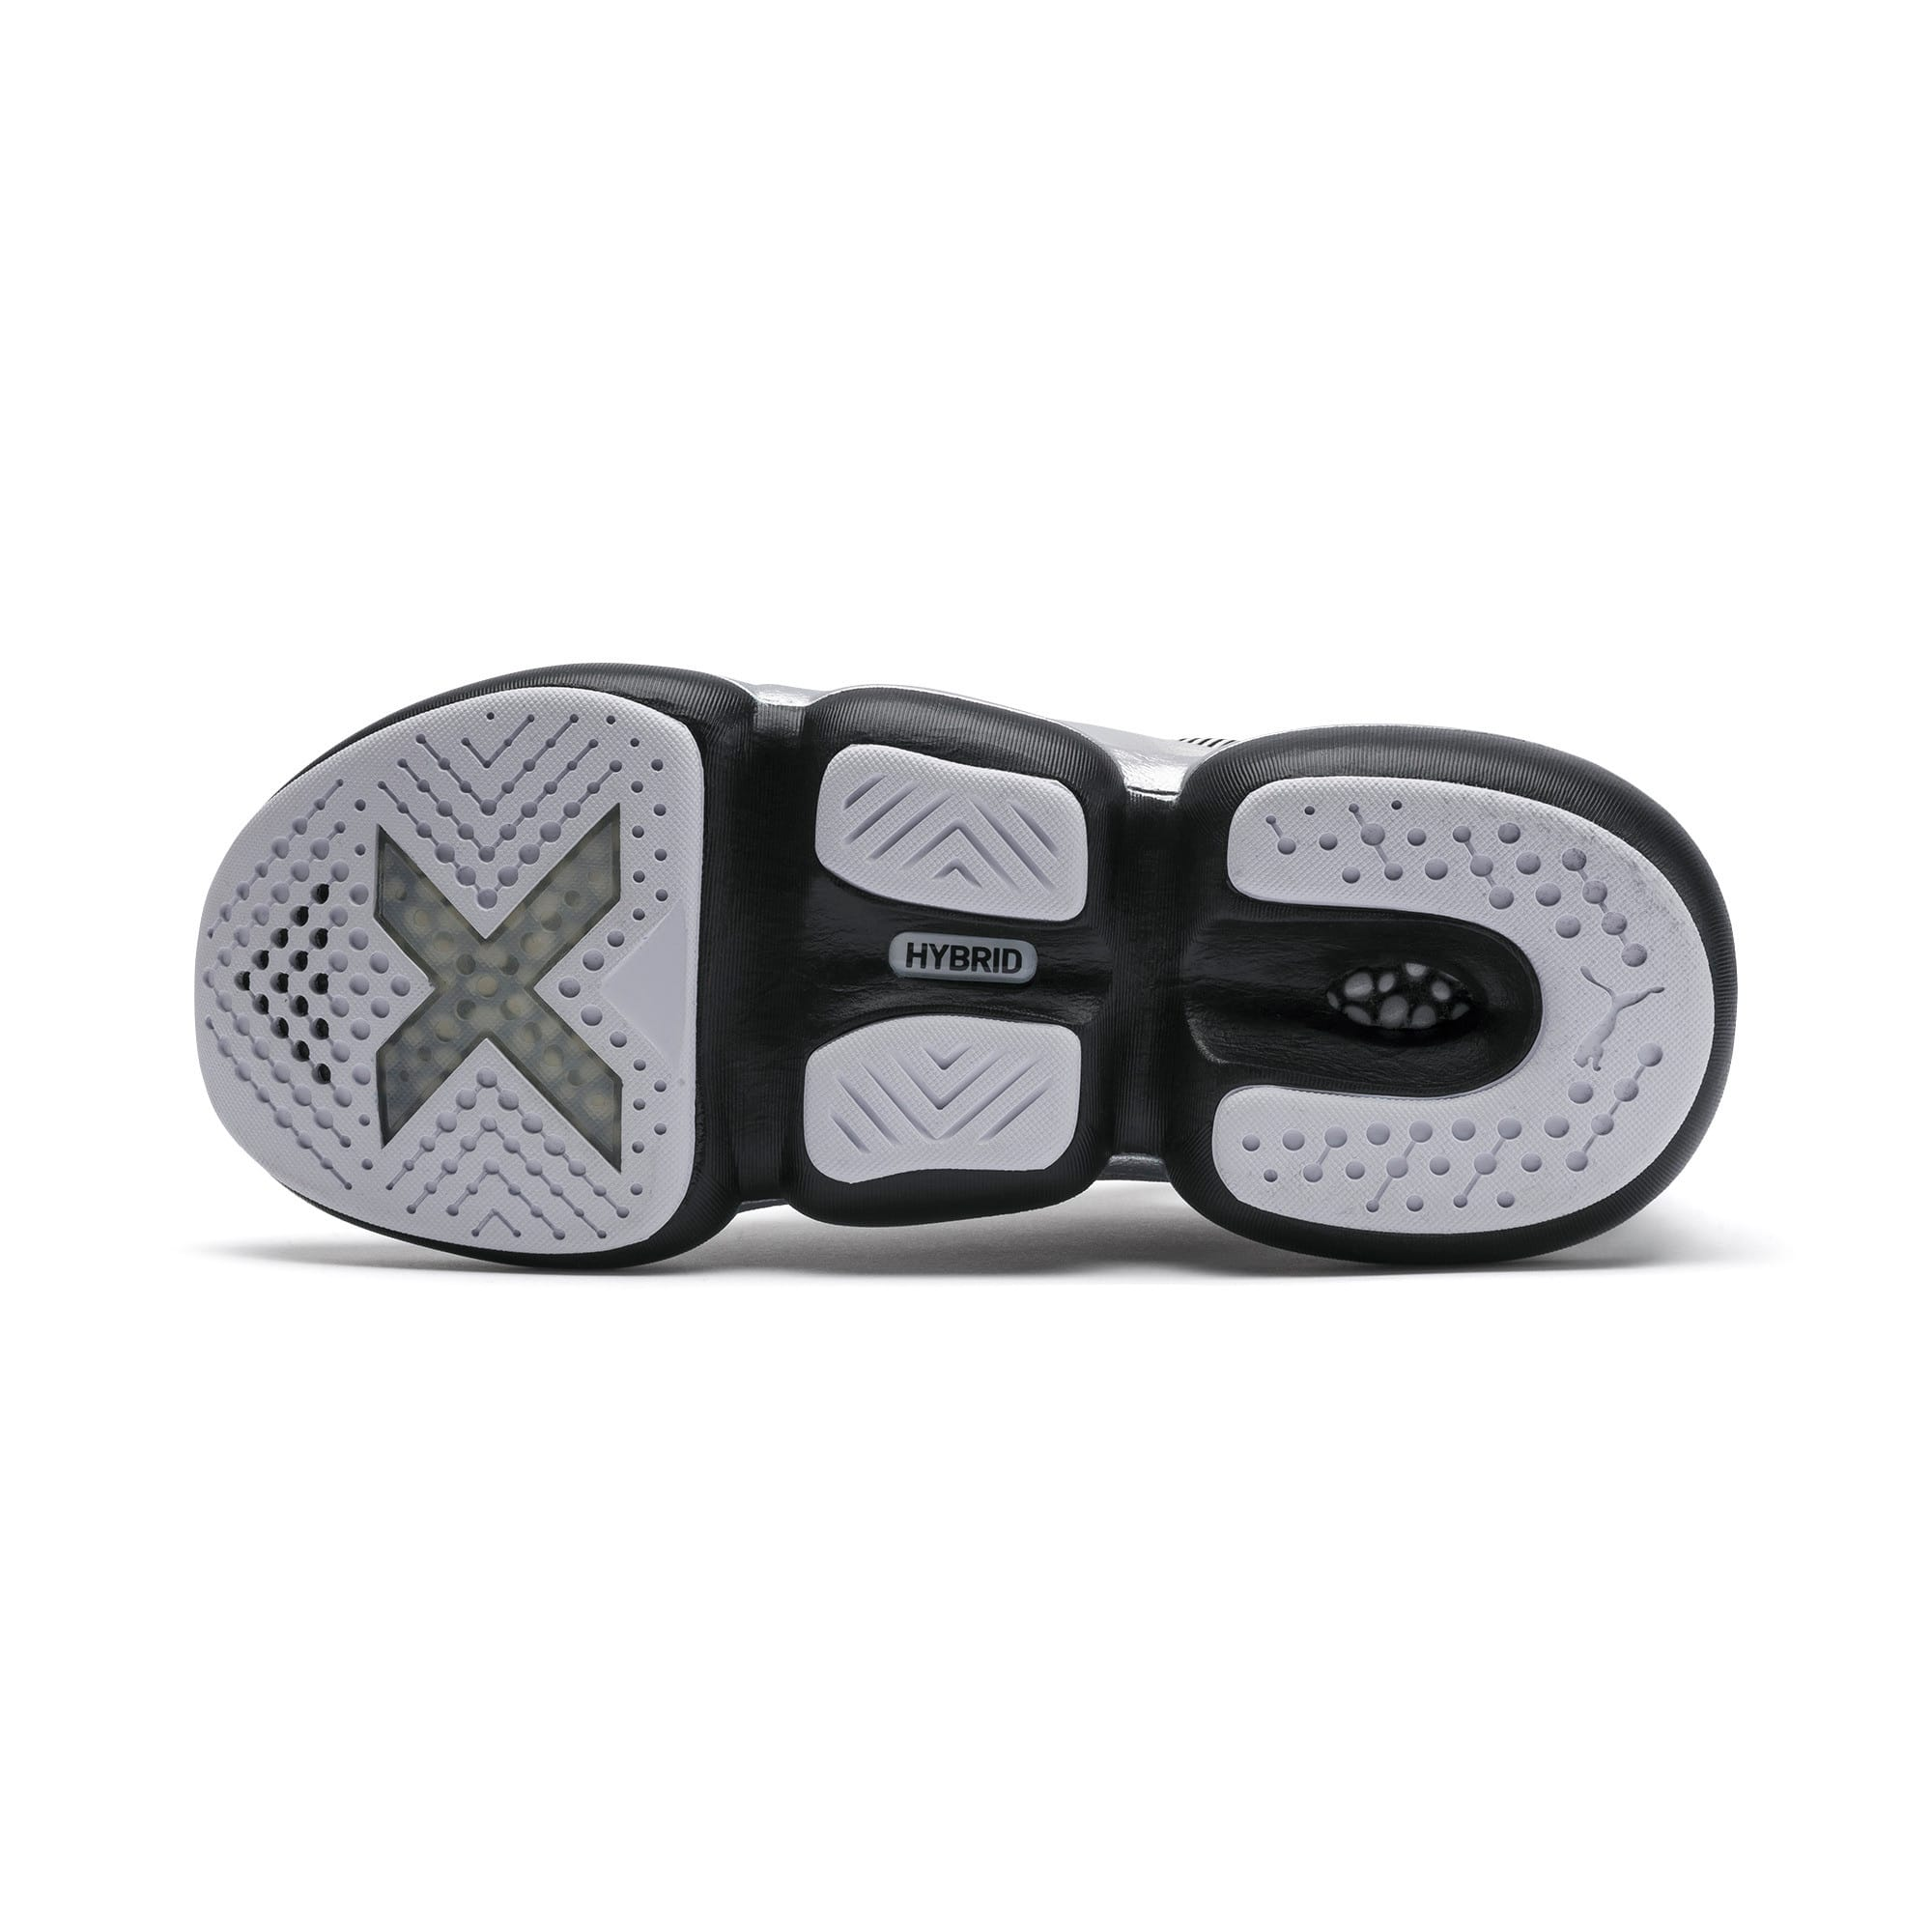 Thumbnail 4 of Mode XT Lust Women's Training Shoes, Glacier Gray-Puma Black, medium